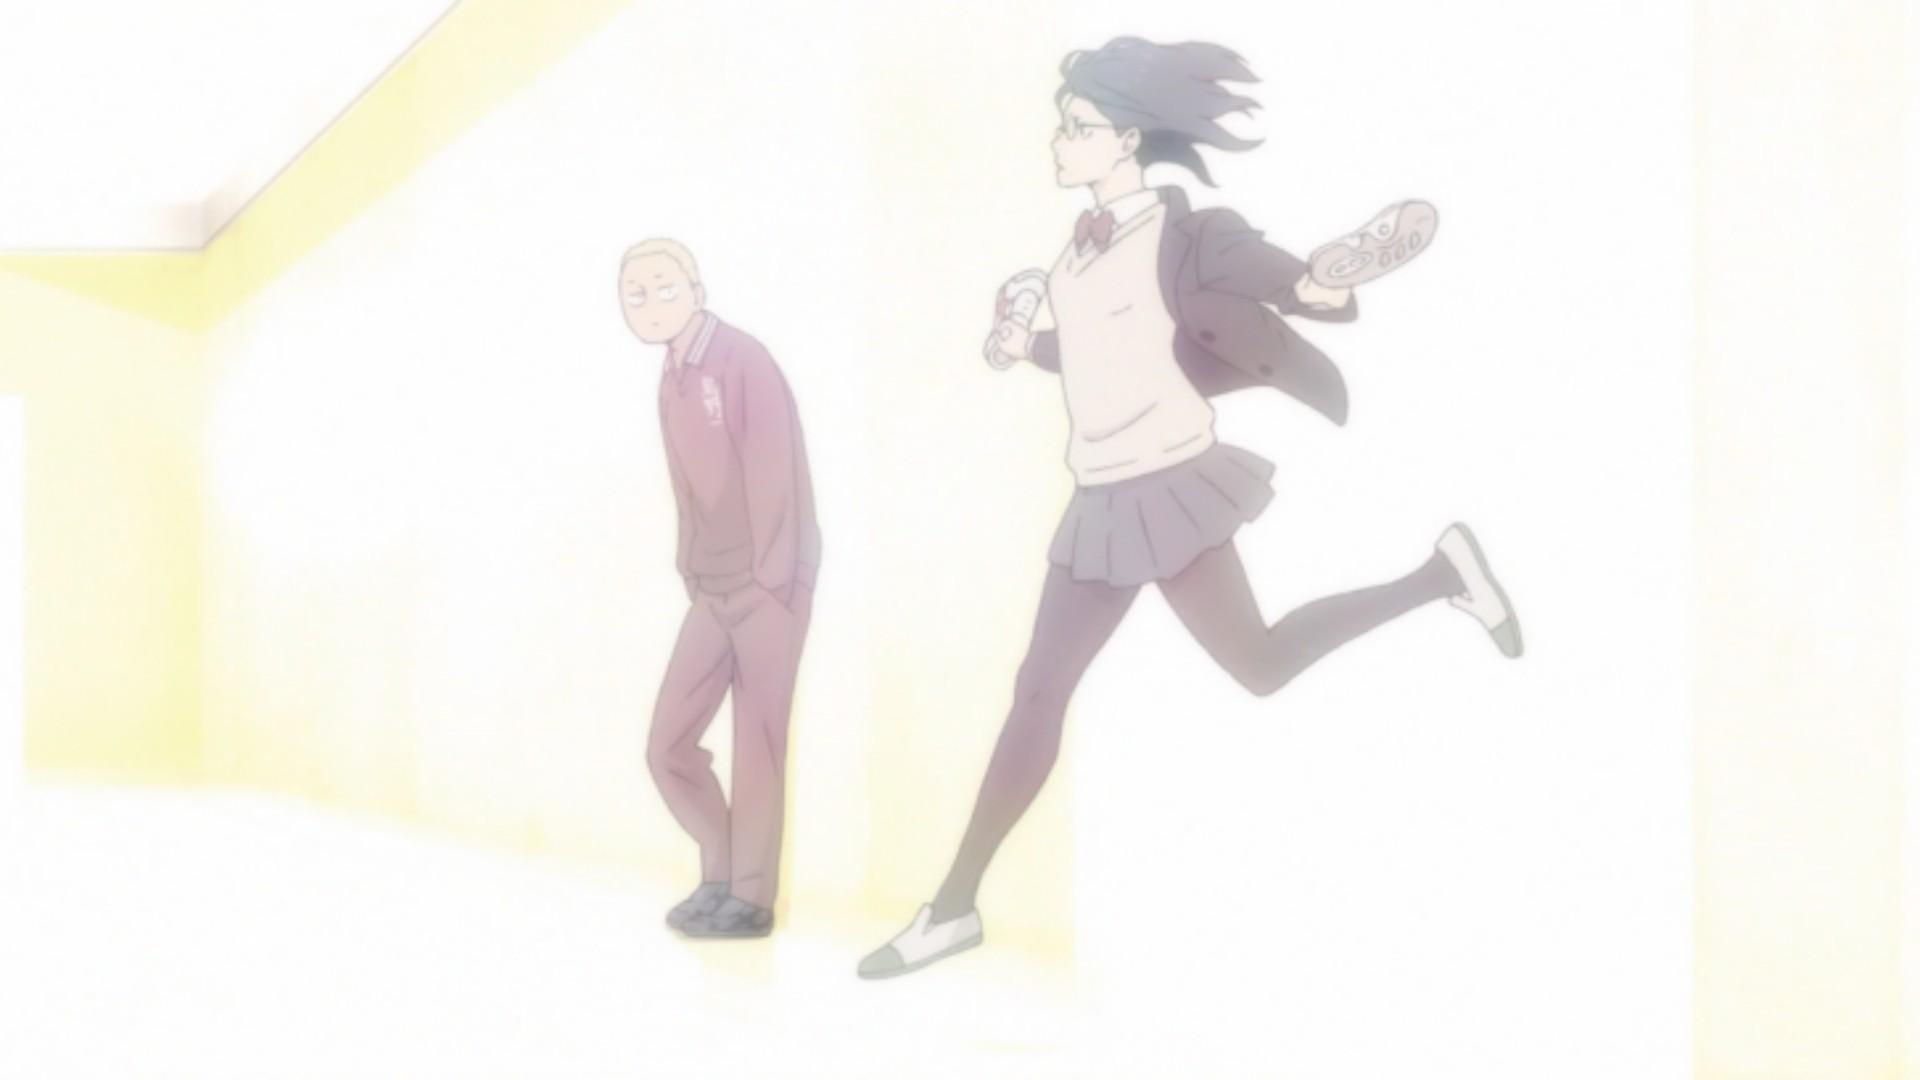 Haikyuu!! Season 4 Part 2 - Episode 3